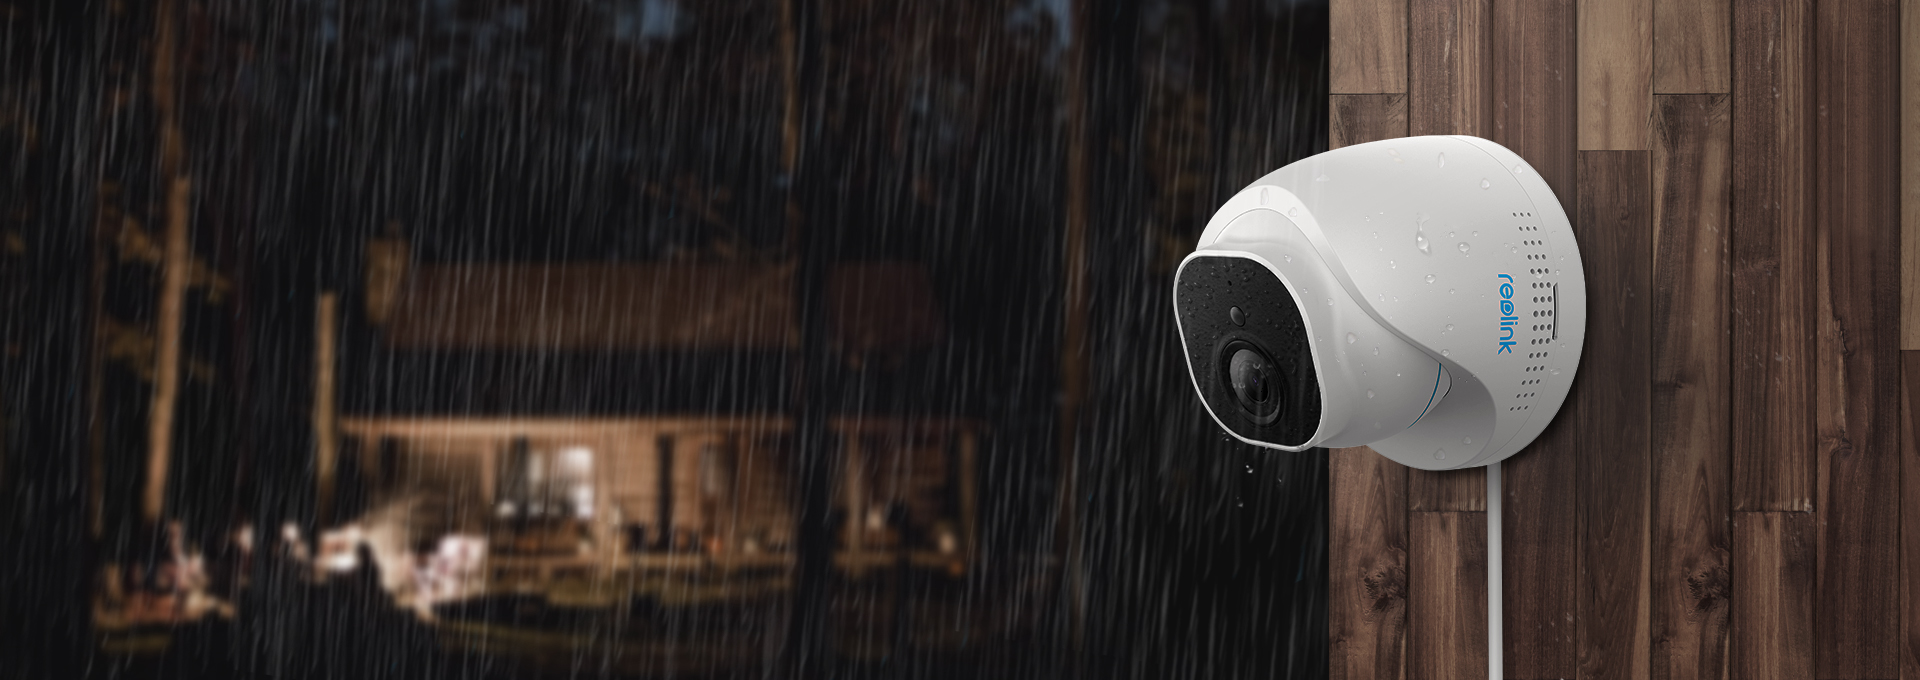 IP66 Waterproof 5MP Outdoor Indoor AI Security Camera System